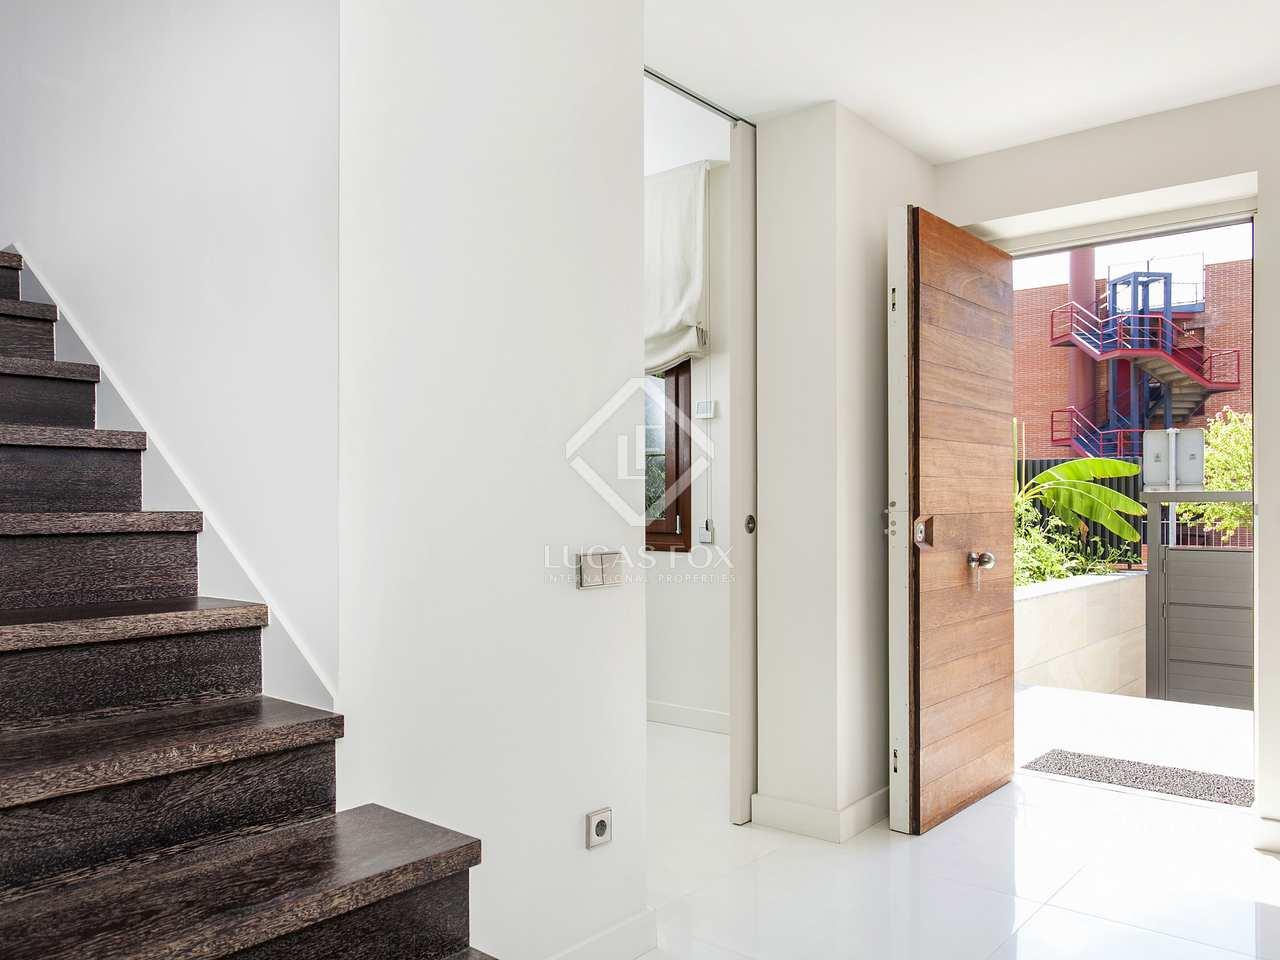 Casa de 5 dormitorios en alquiler en sarri bonanova for Alquiler casa jardin barcelona